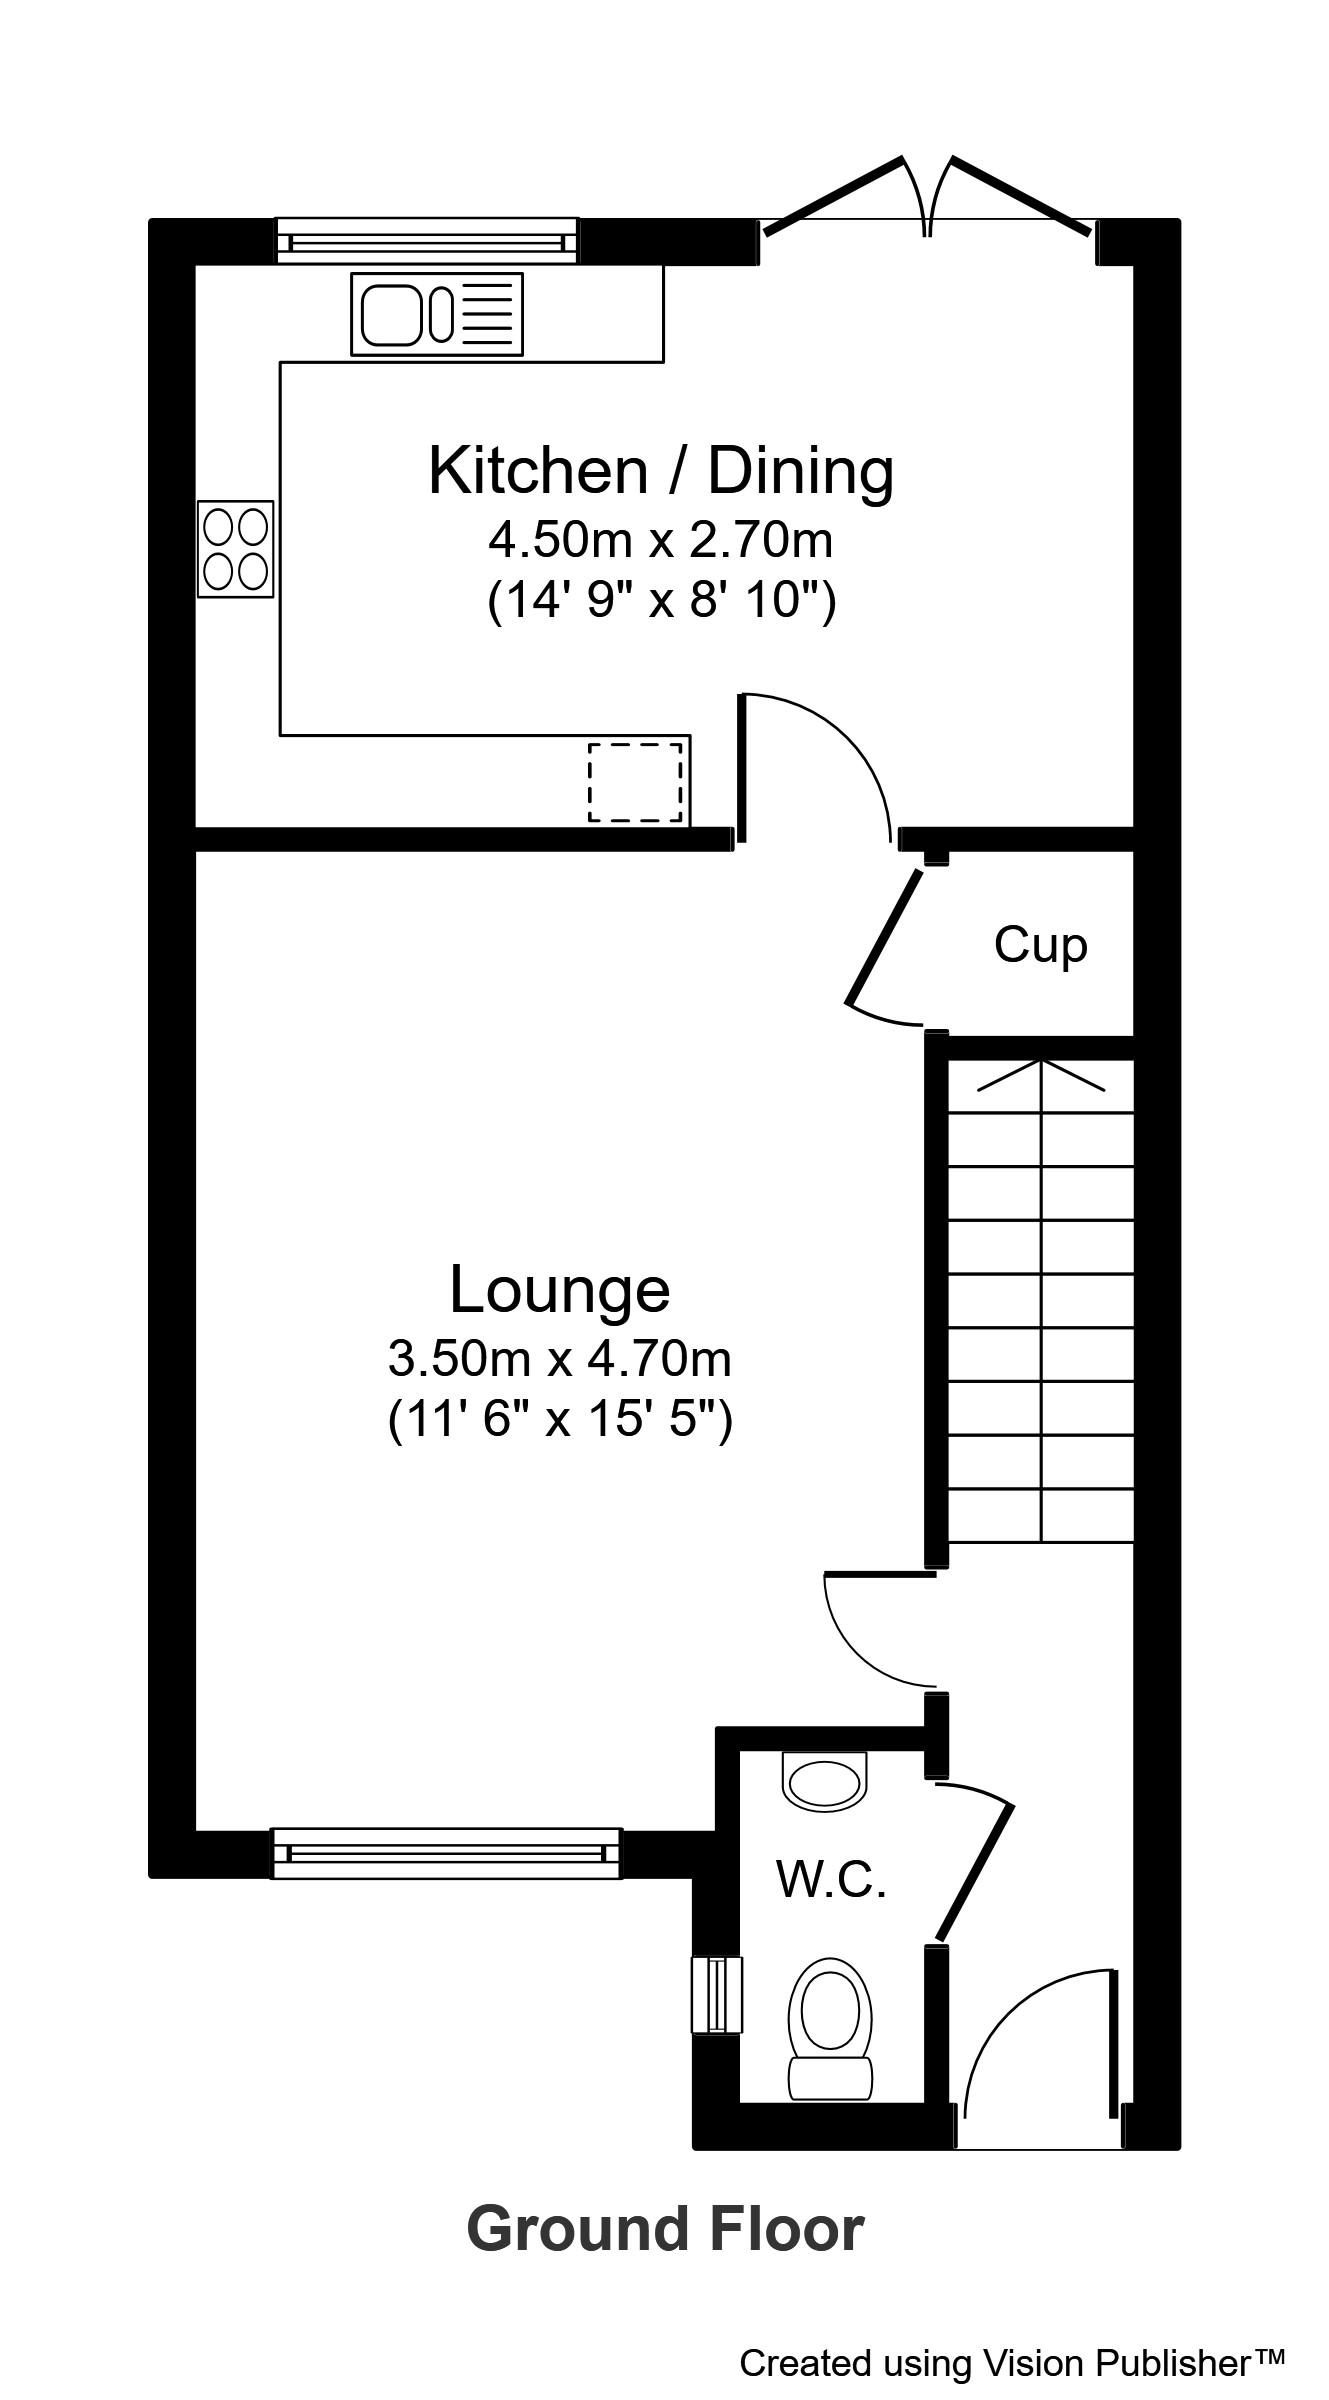 5 finchley close GF Floor Plans (Auto Sized) (1)